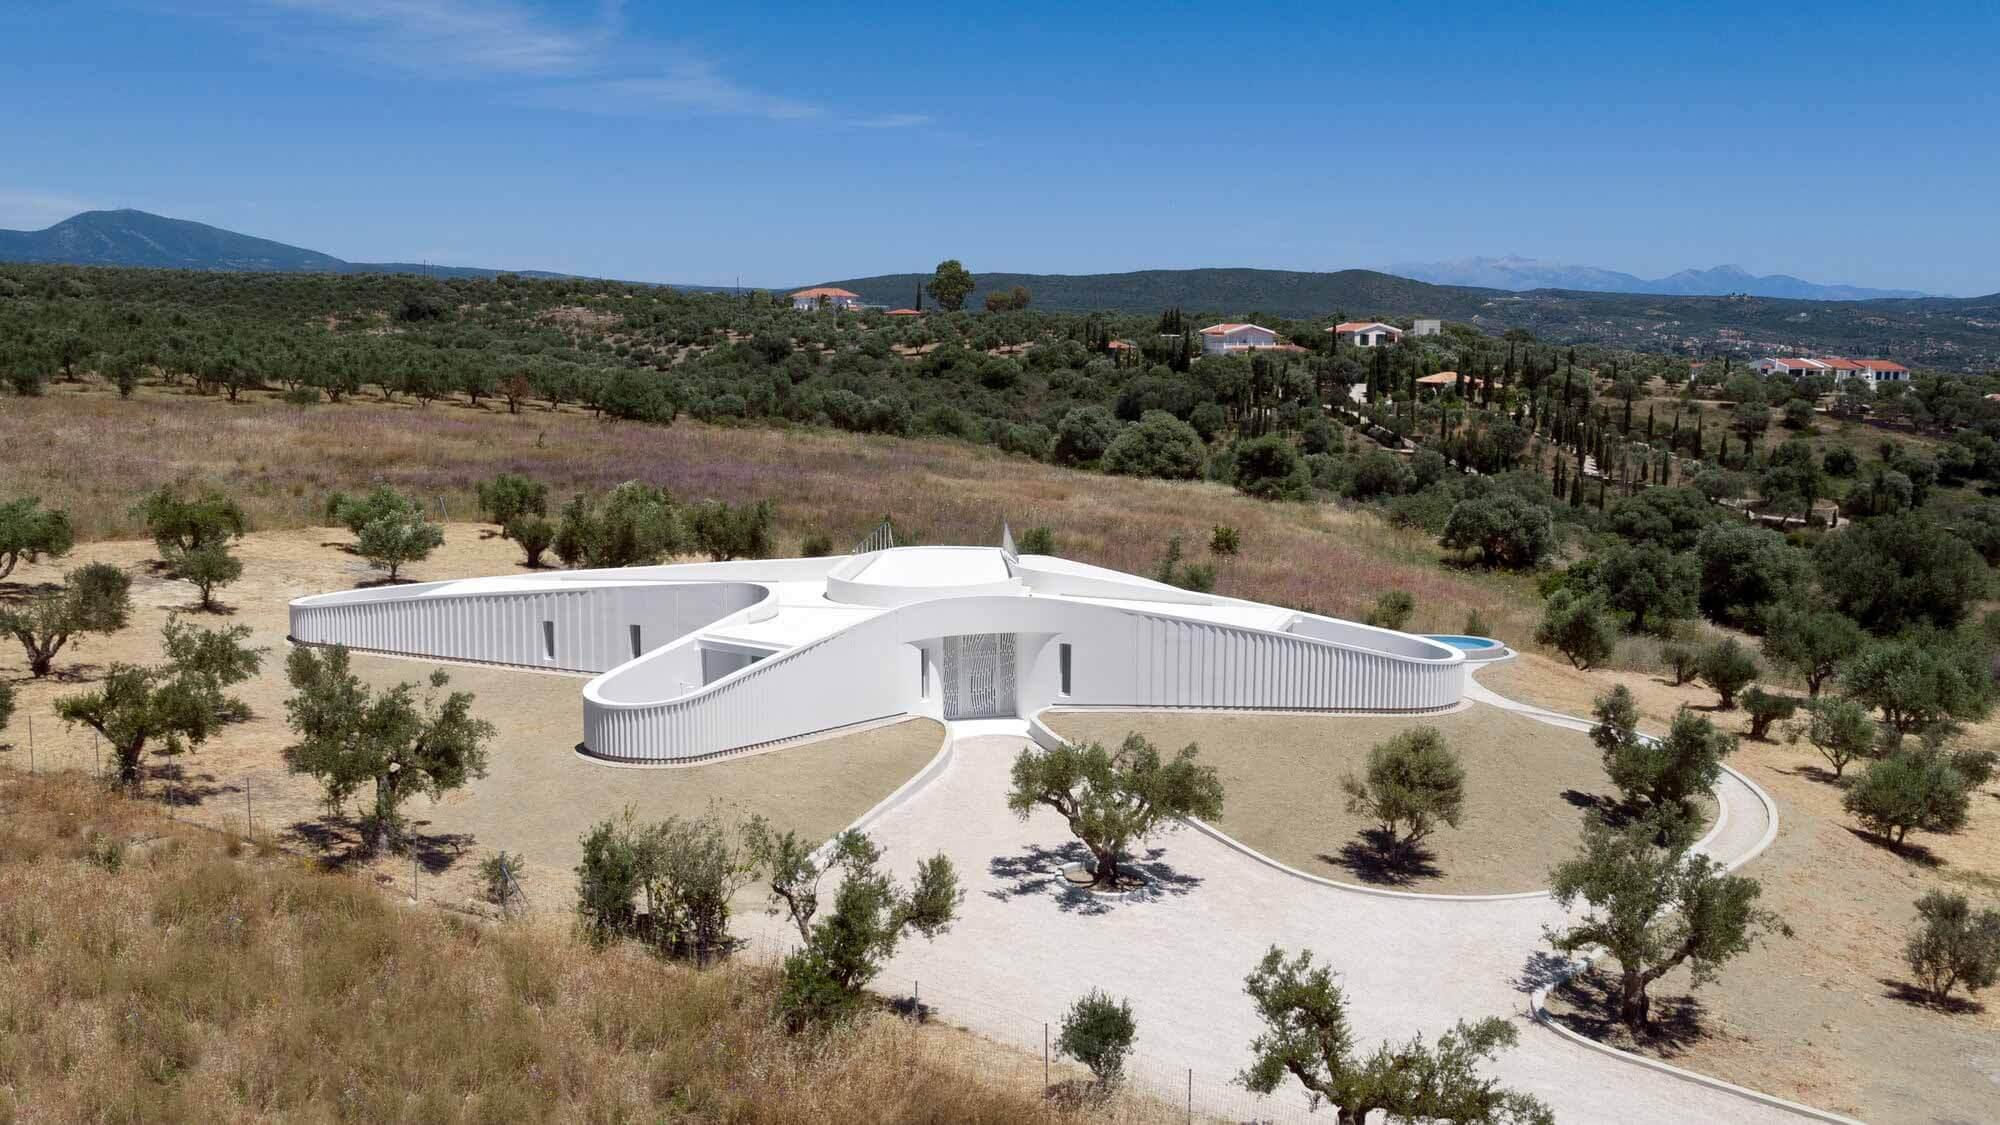 KHI House & Art Space / LASSA architects